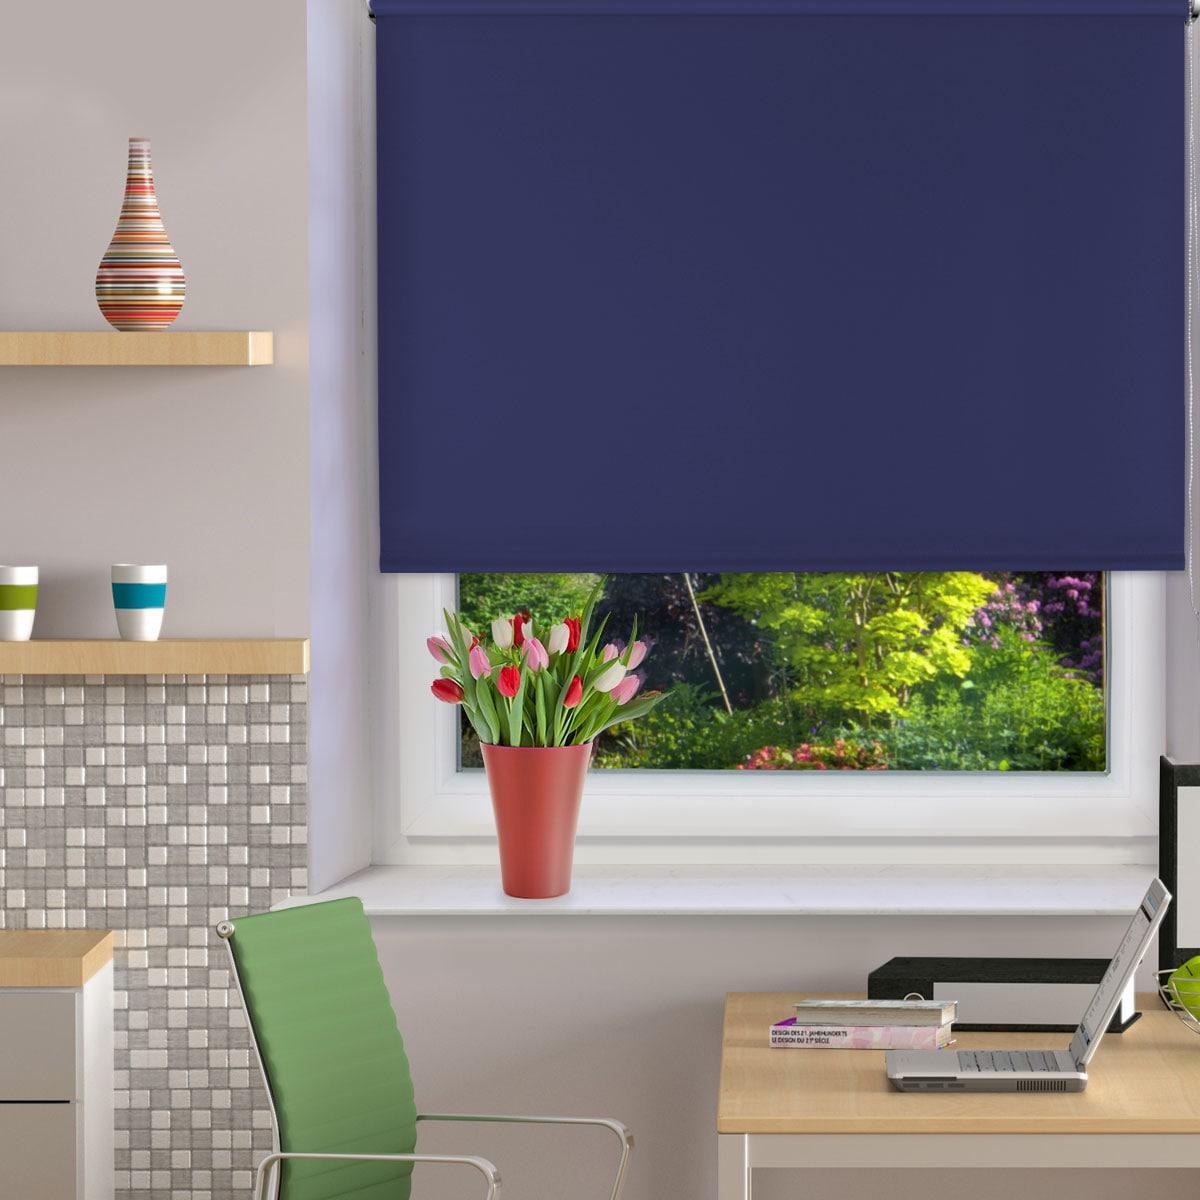 rollos standard rollos seitenzugrollos f r fenster und. Black Bedroom Furniture Sets. Home Design Ideas